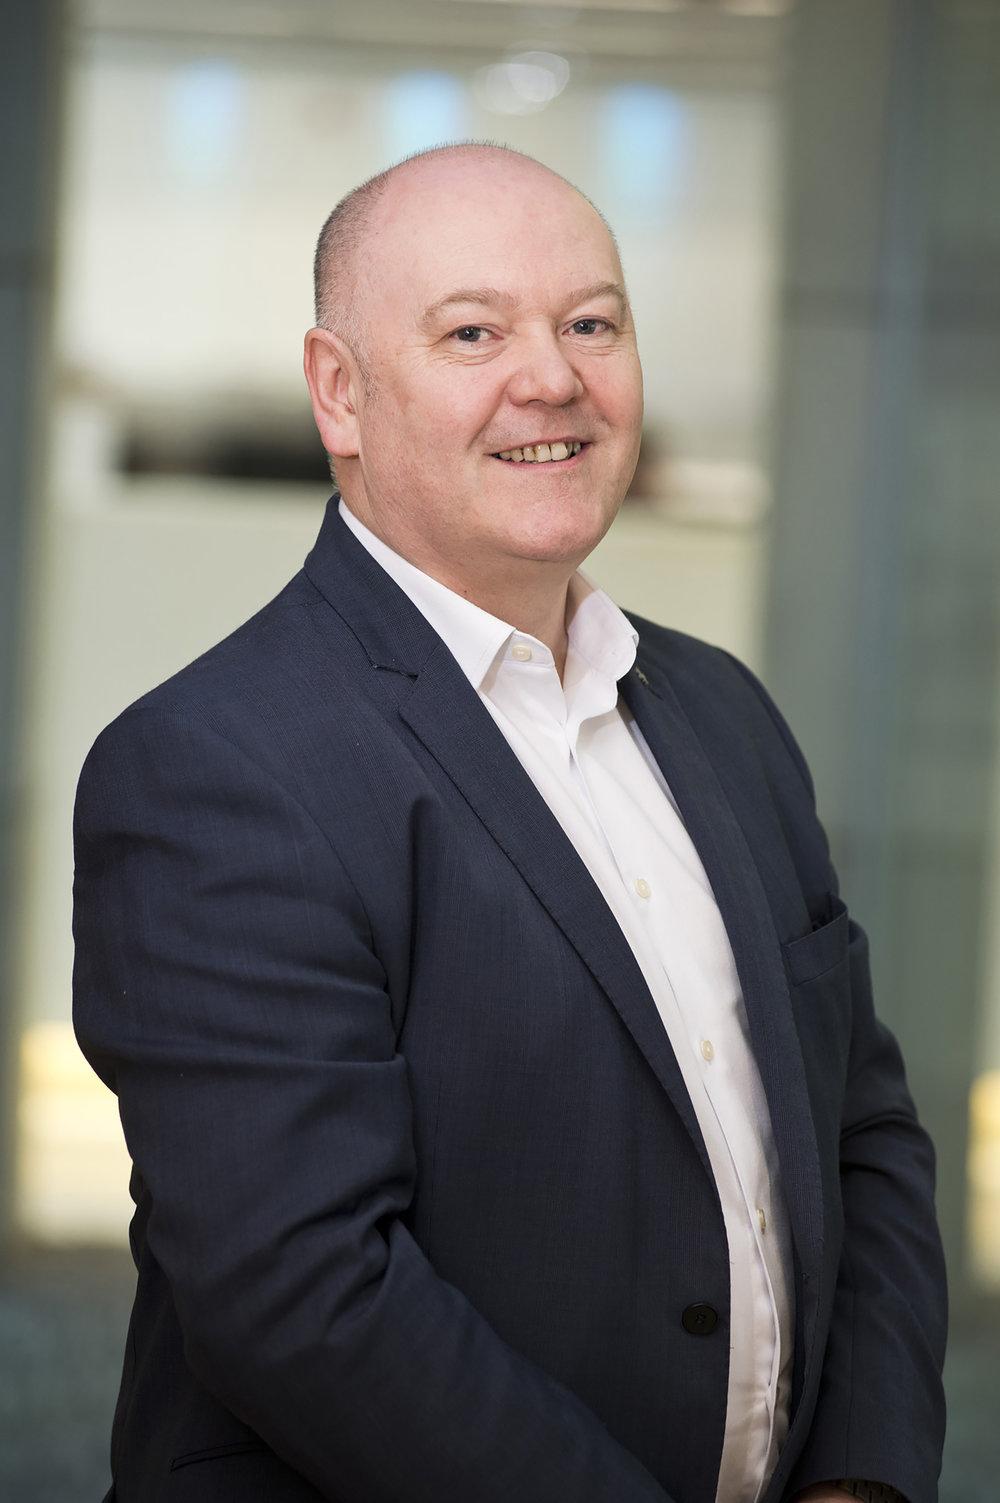 Richard Smeaton Regional Manager